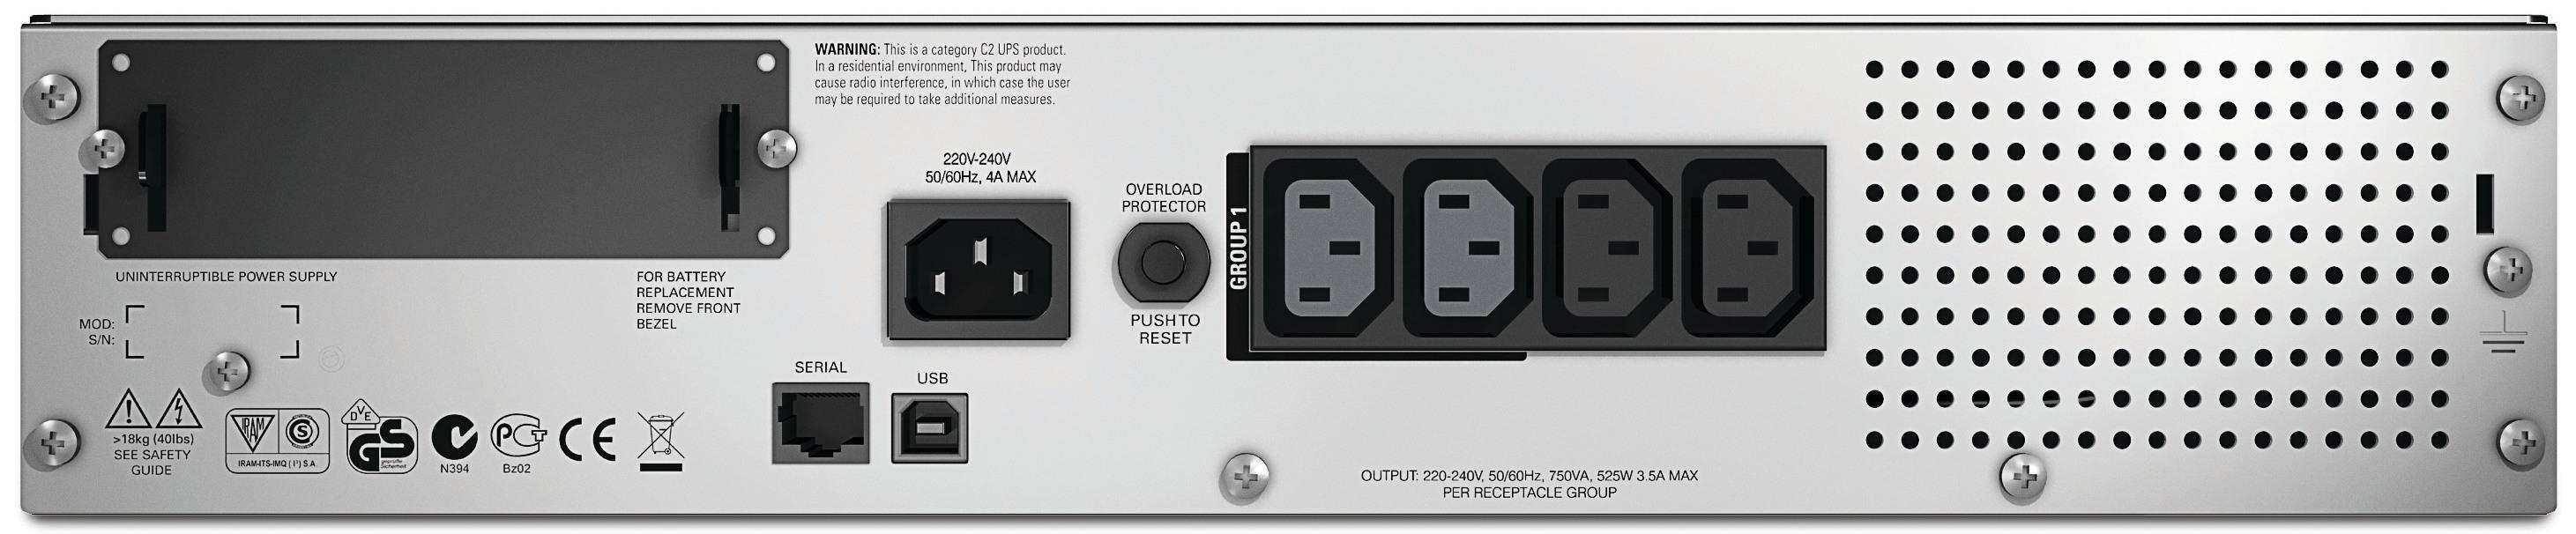 APC-by-Schneider-Electric-Smart-UPS-SMT750RMI2U-Rear